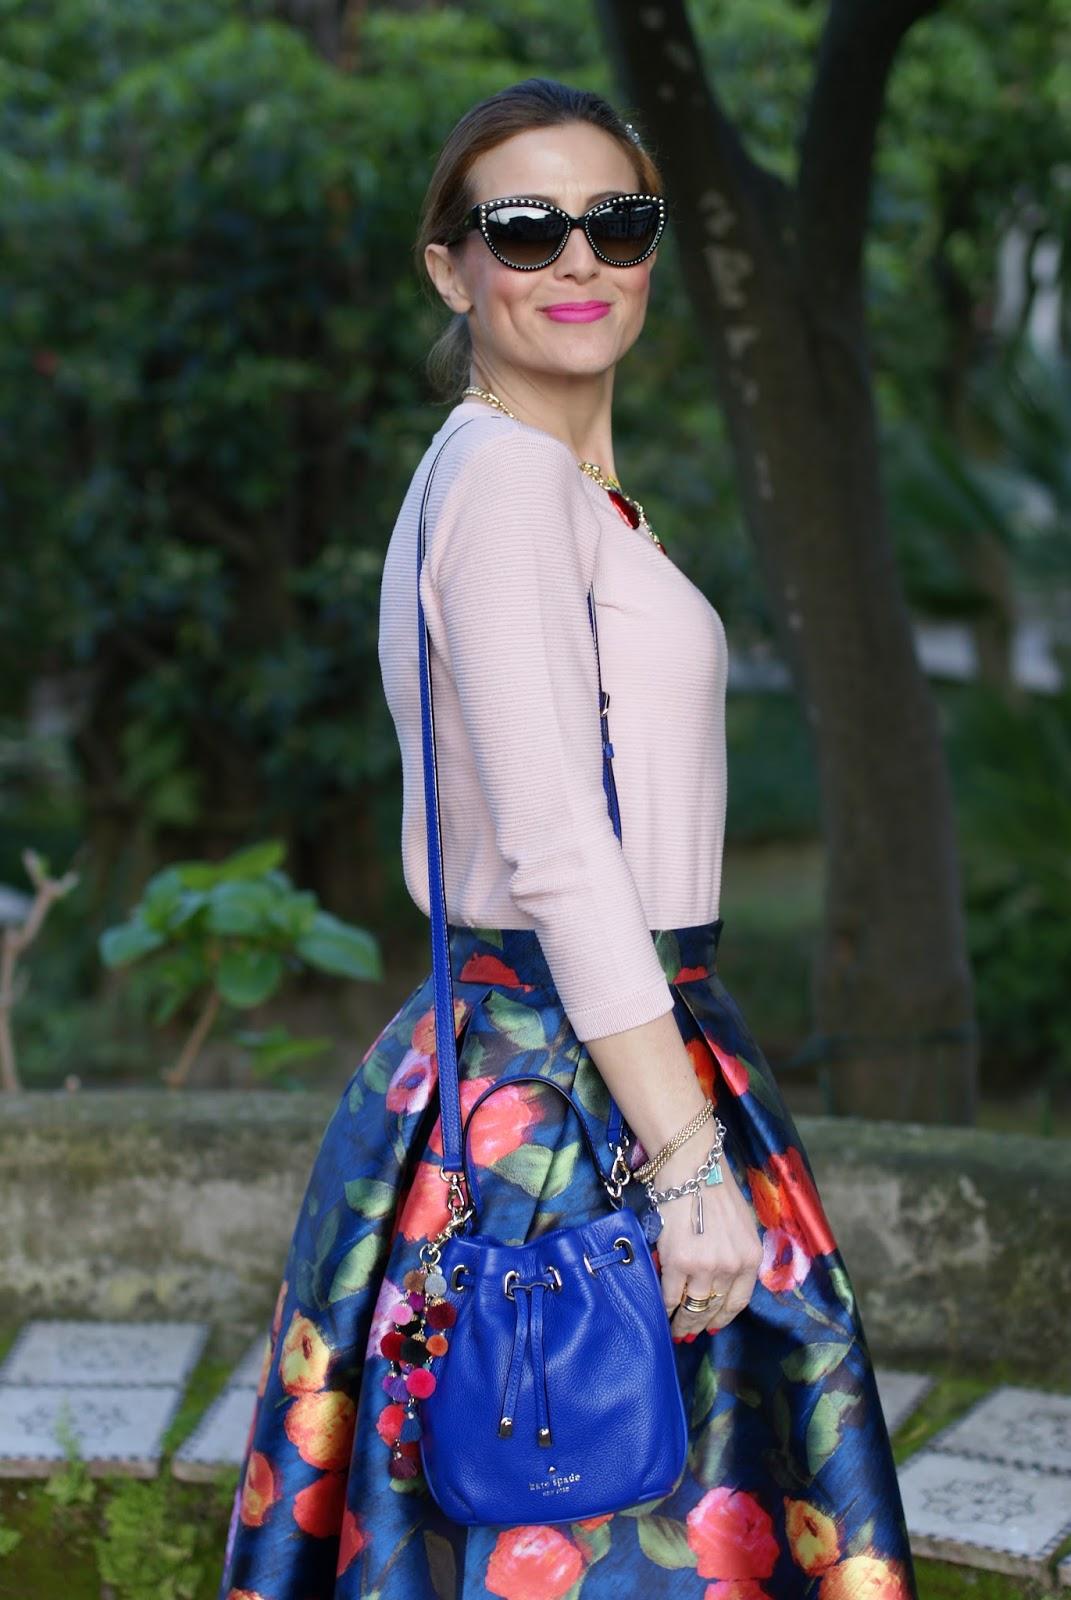 Paccio midi skirt and Kate Spade bucket bag on Fashion and Cookies fashion blog, fashion blogger style